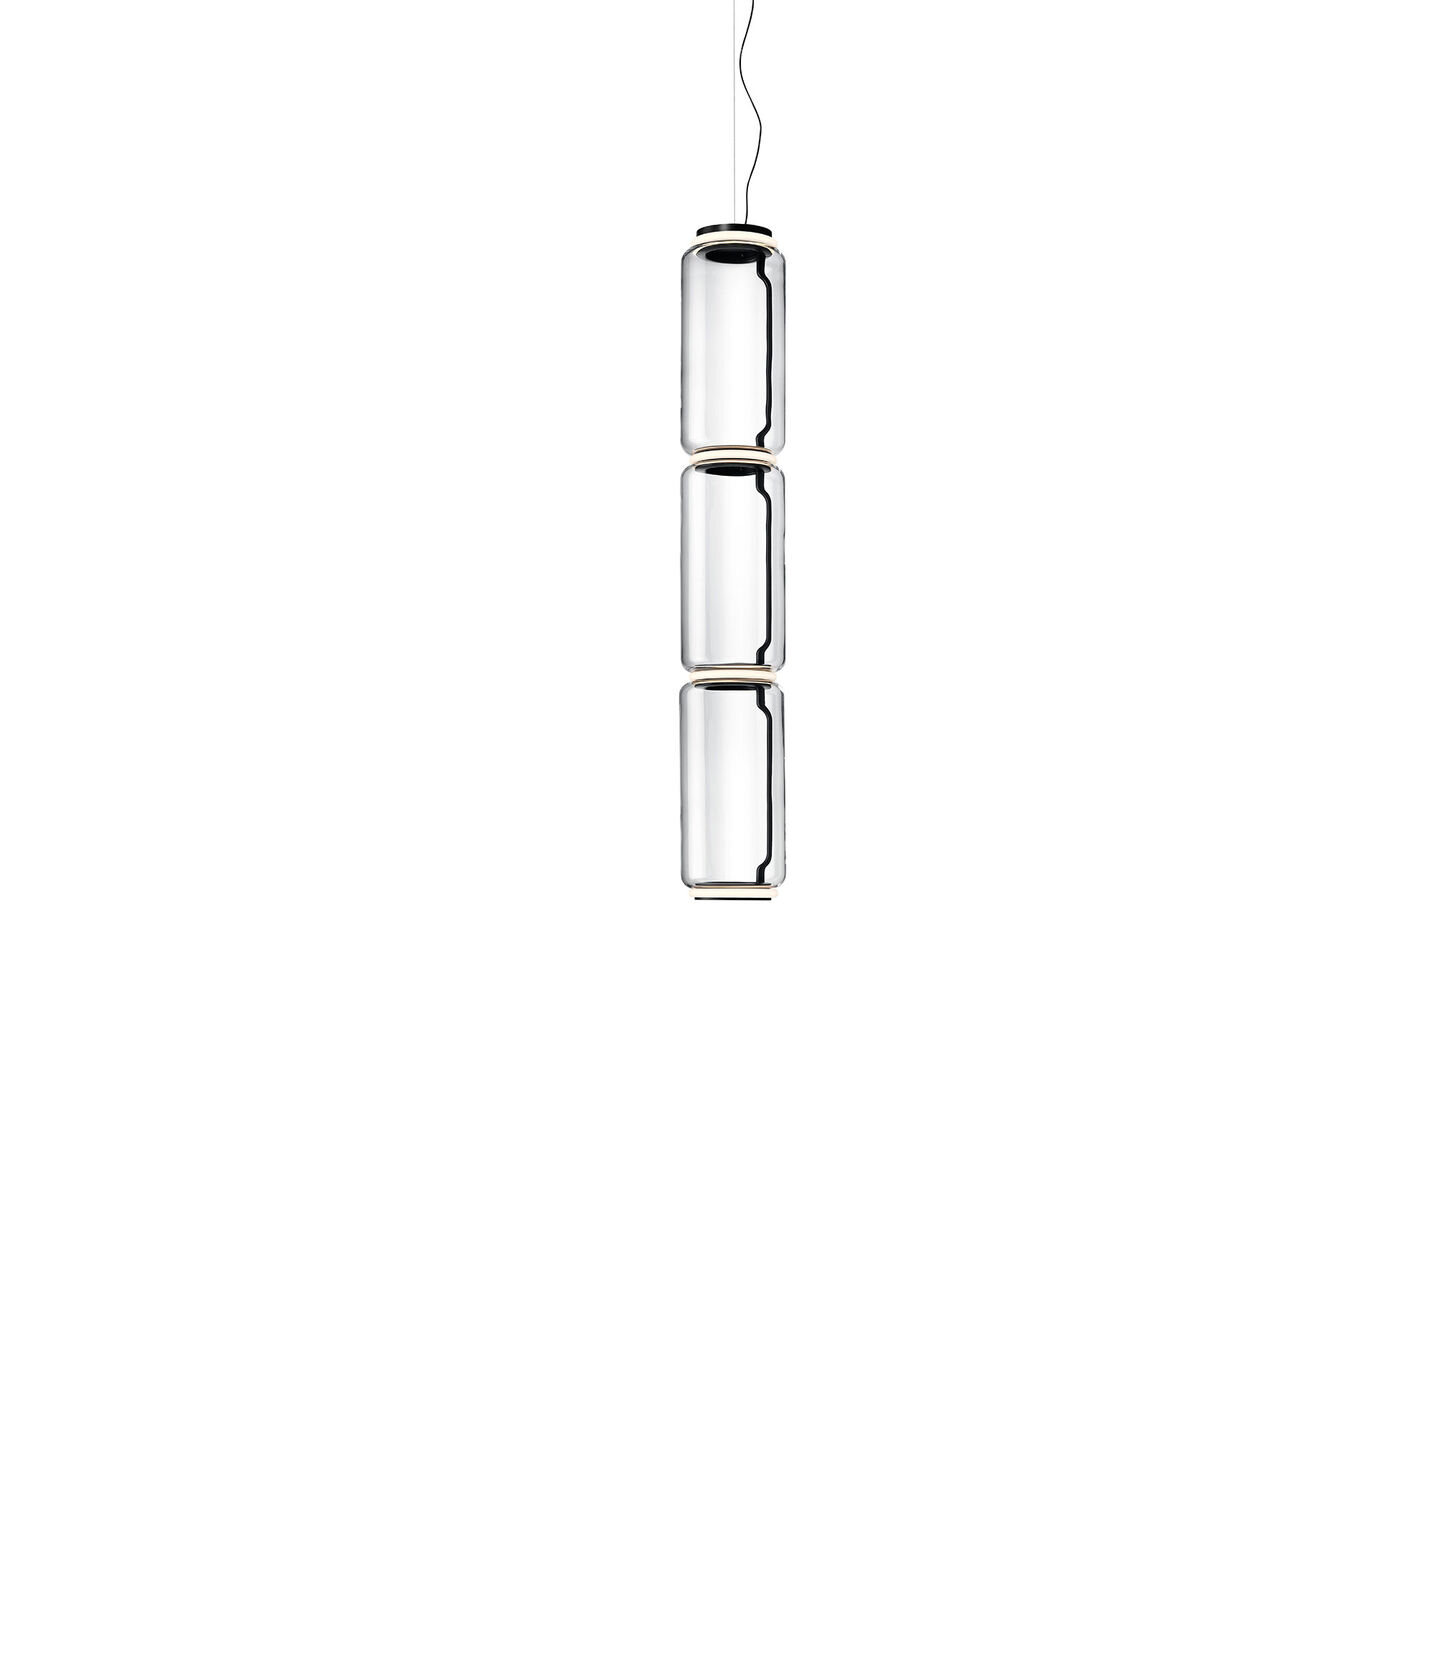 noctambule-3-cylinders-suspension-grcic-flos-F0276000-product-still-life-big